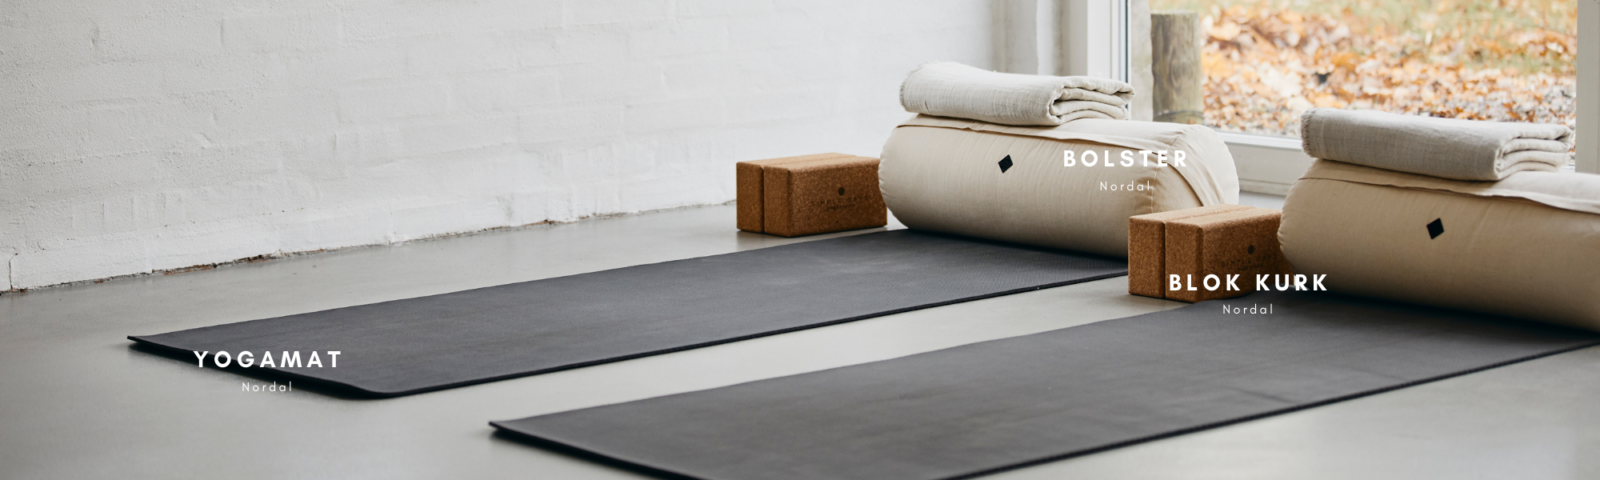 yoga huiszwaluw home